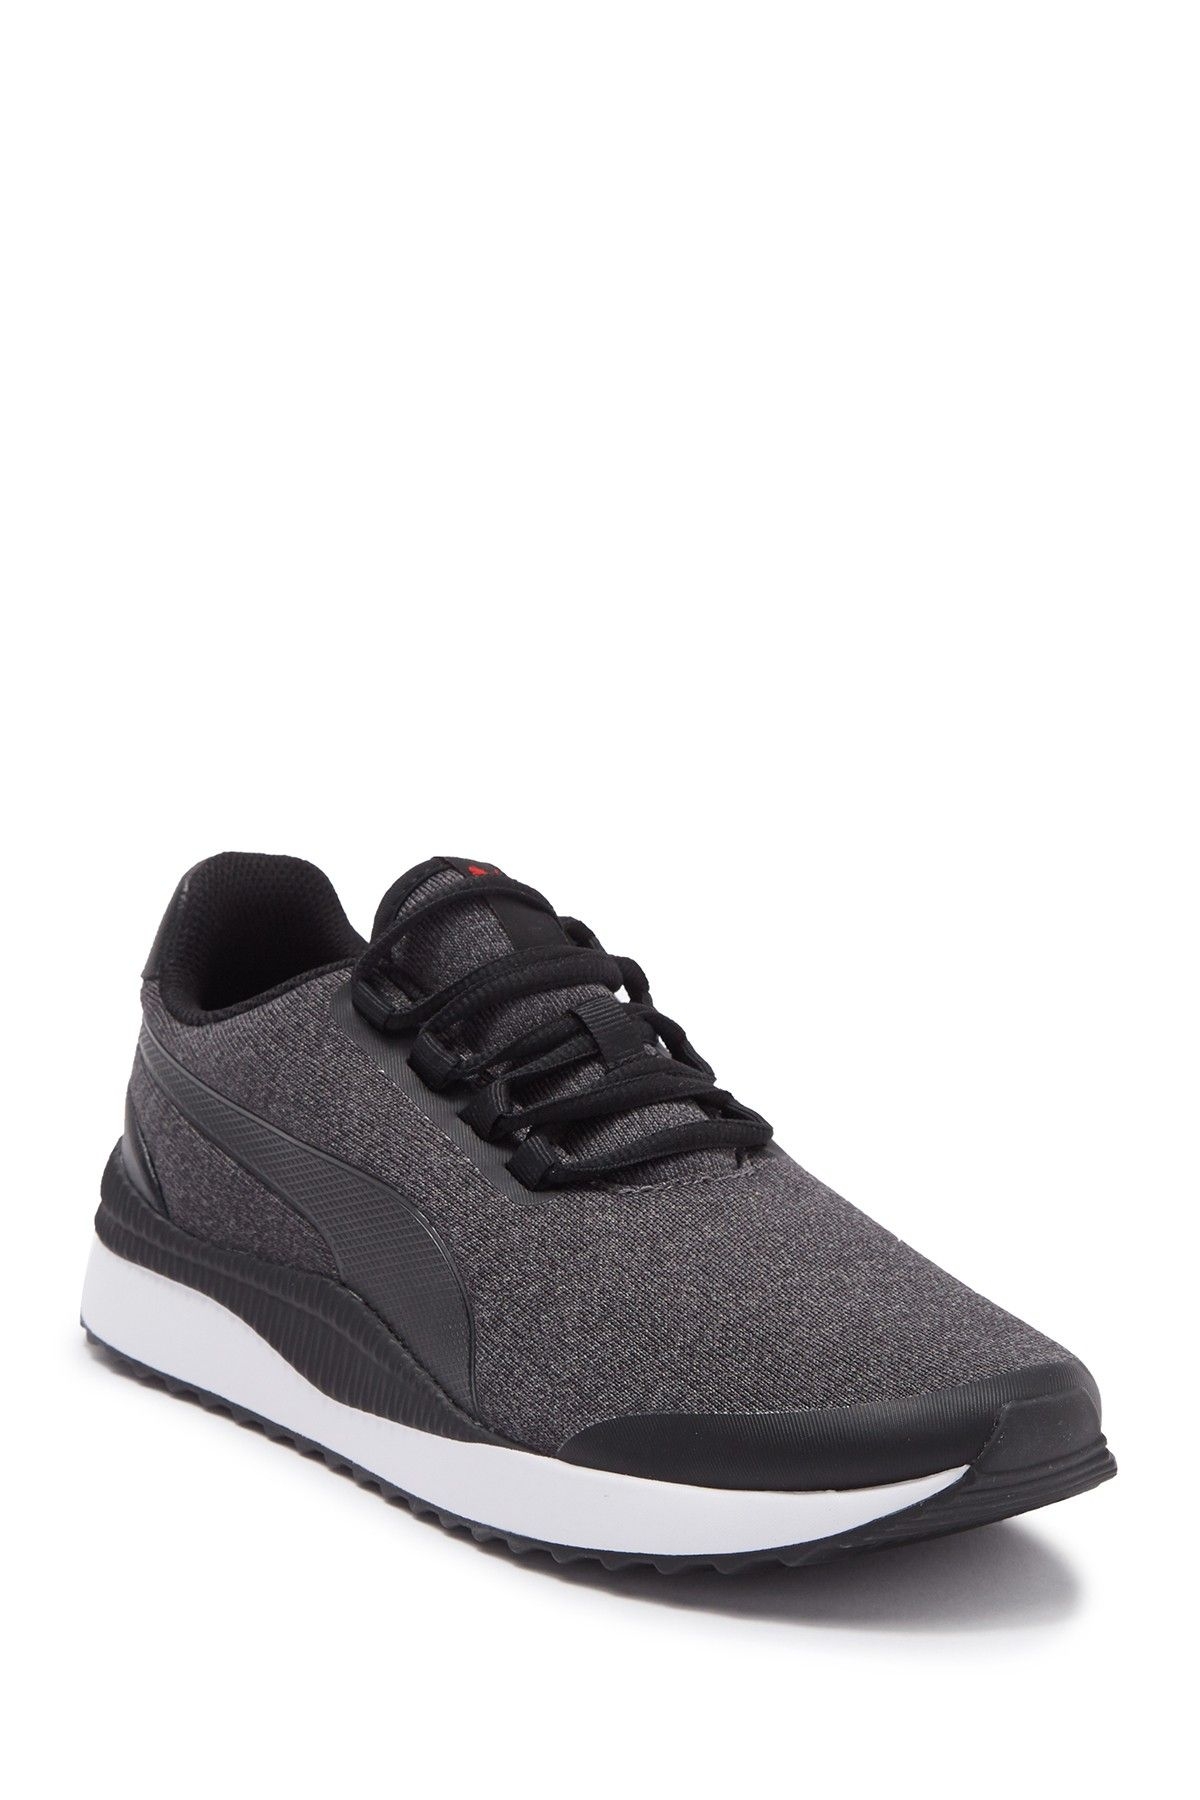 Puma Pacer Next Fs Knit Sneaker In